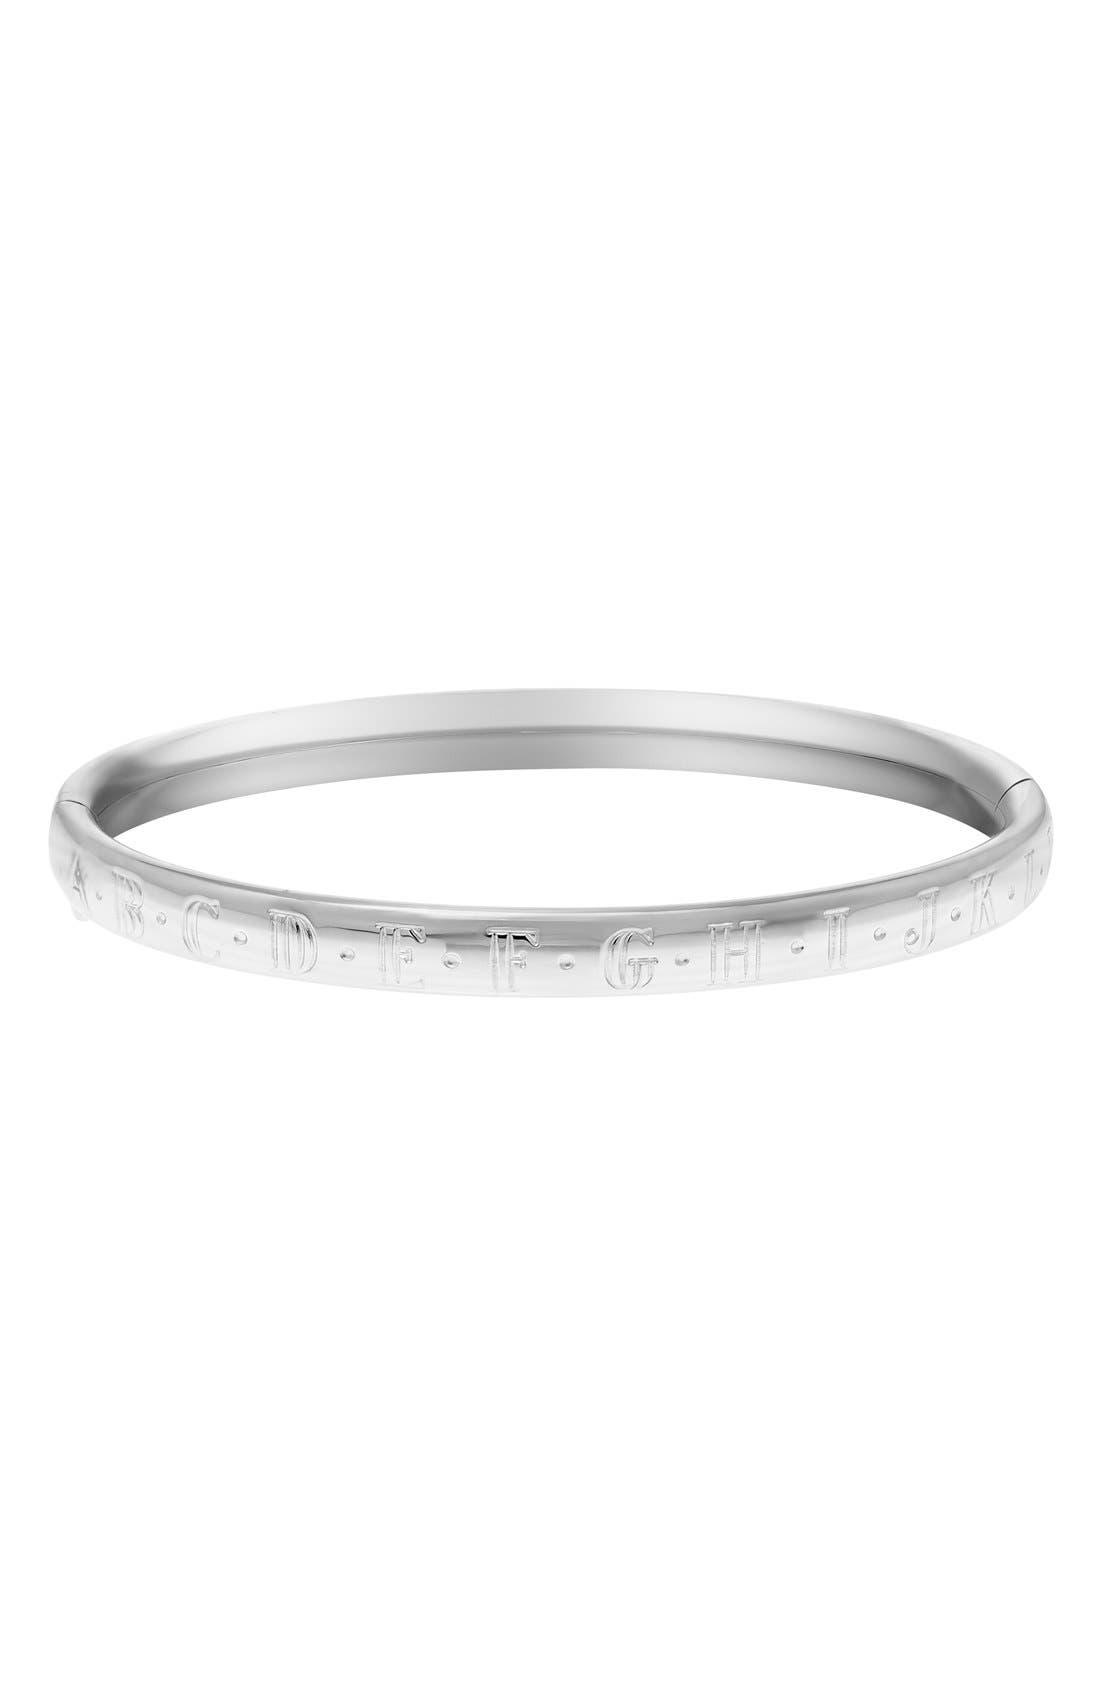 Alphabet Sterling Silver Bracelet,                         Main,                         color, Metallic